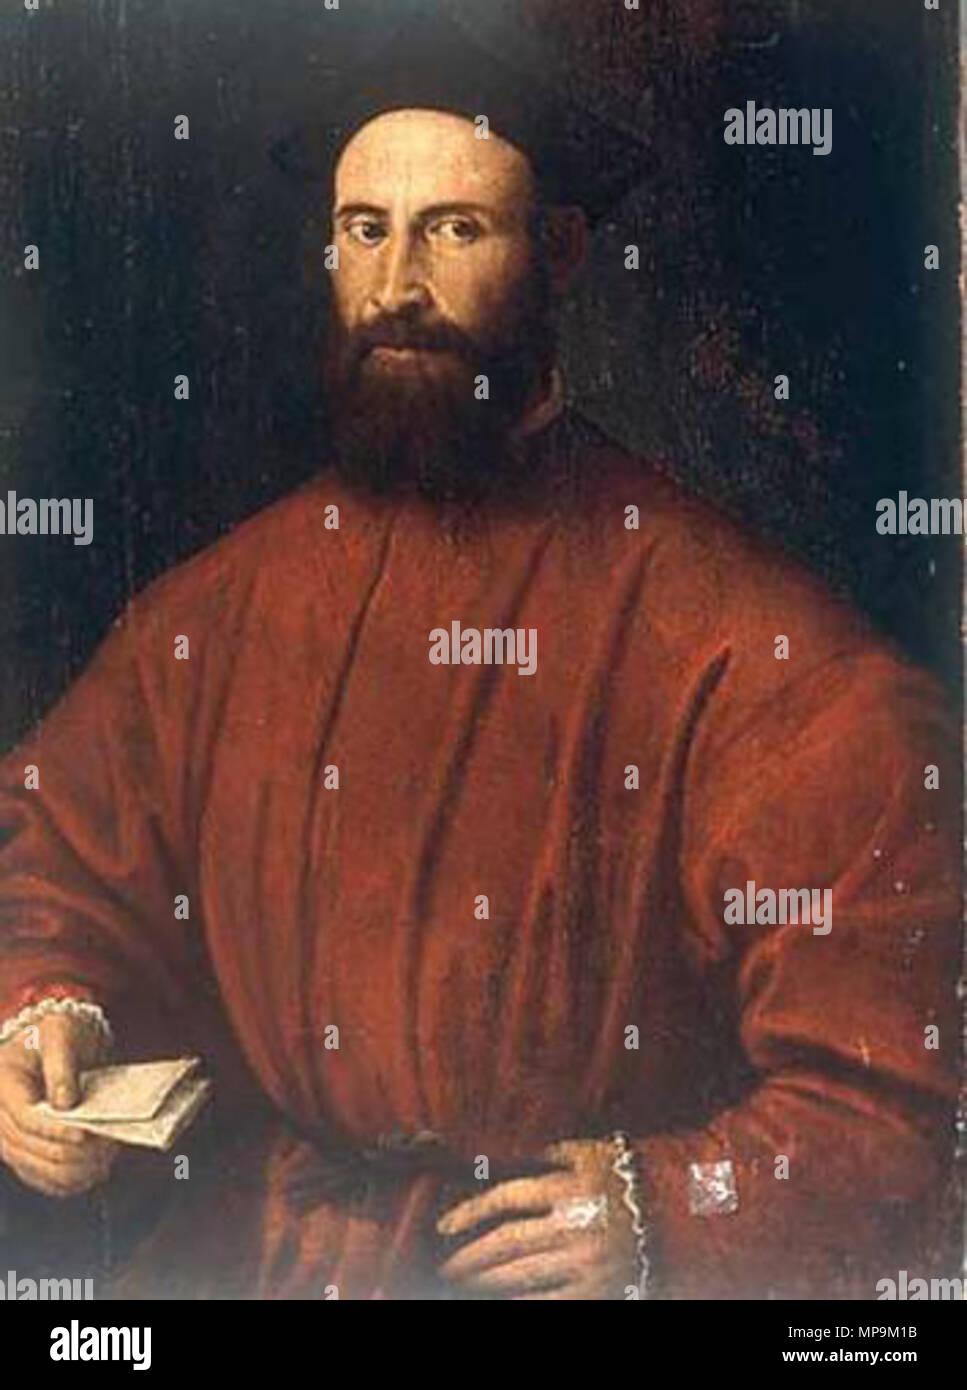 . A man with letter . circa 1508/12.   Lorenzo Lotto (1480–)   Description Italian painter and fresco painter  Date of birth/death circa 1480 1556 / 1557  Location of birth/death Venice Loreto  Work location Recanati (1506-1508), Venice (1500), Treviso (1503-1506), Rome (1509-1512), Bergamo (1513-1525), Venice (1513-1517), Treviso (1525-1527), Venice (1527-1529), Loreto, Venice (1529-1539), Treviso (1540-1549), Ancona (1549), Loreto (1556)  Authority control  : Q310973 VIAF:22165049 ISNI:0000 0001 2320 0265 ULAN:500015631 LCCN:n50042418 NLA:35692463 WorldCat 820 Lorenzo Lotto 088 - Stock Image